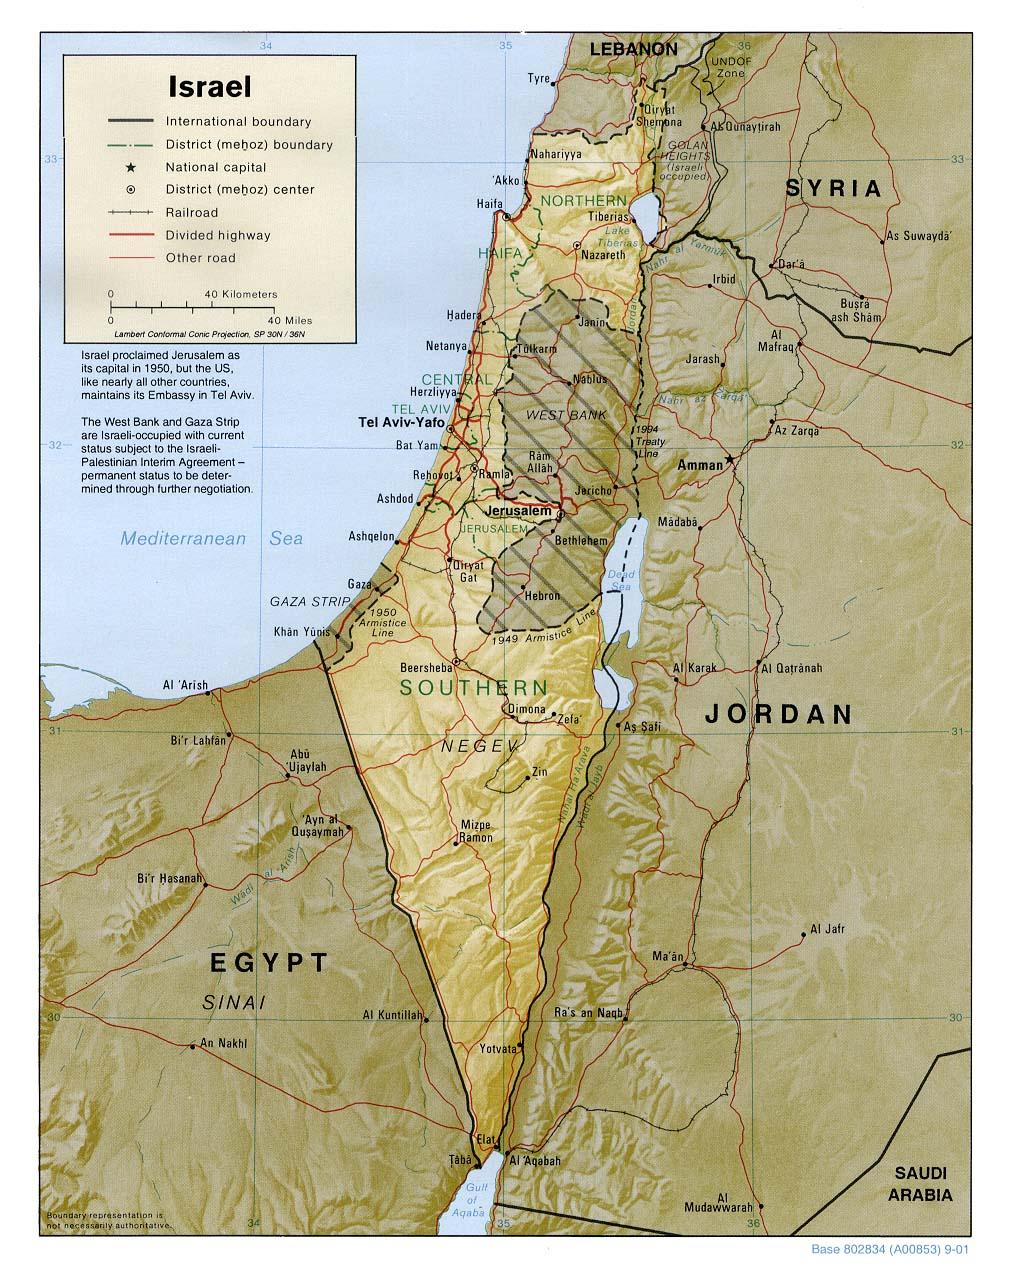 israel - photo #16